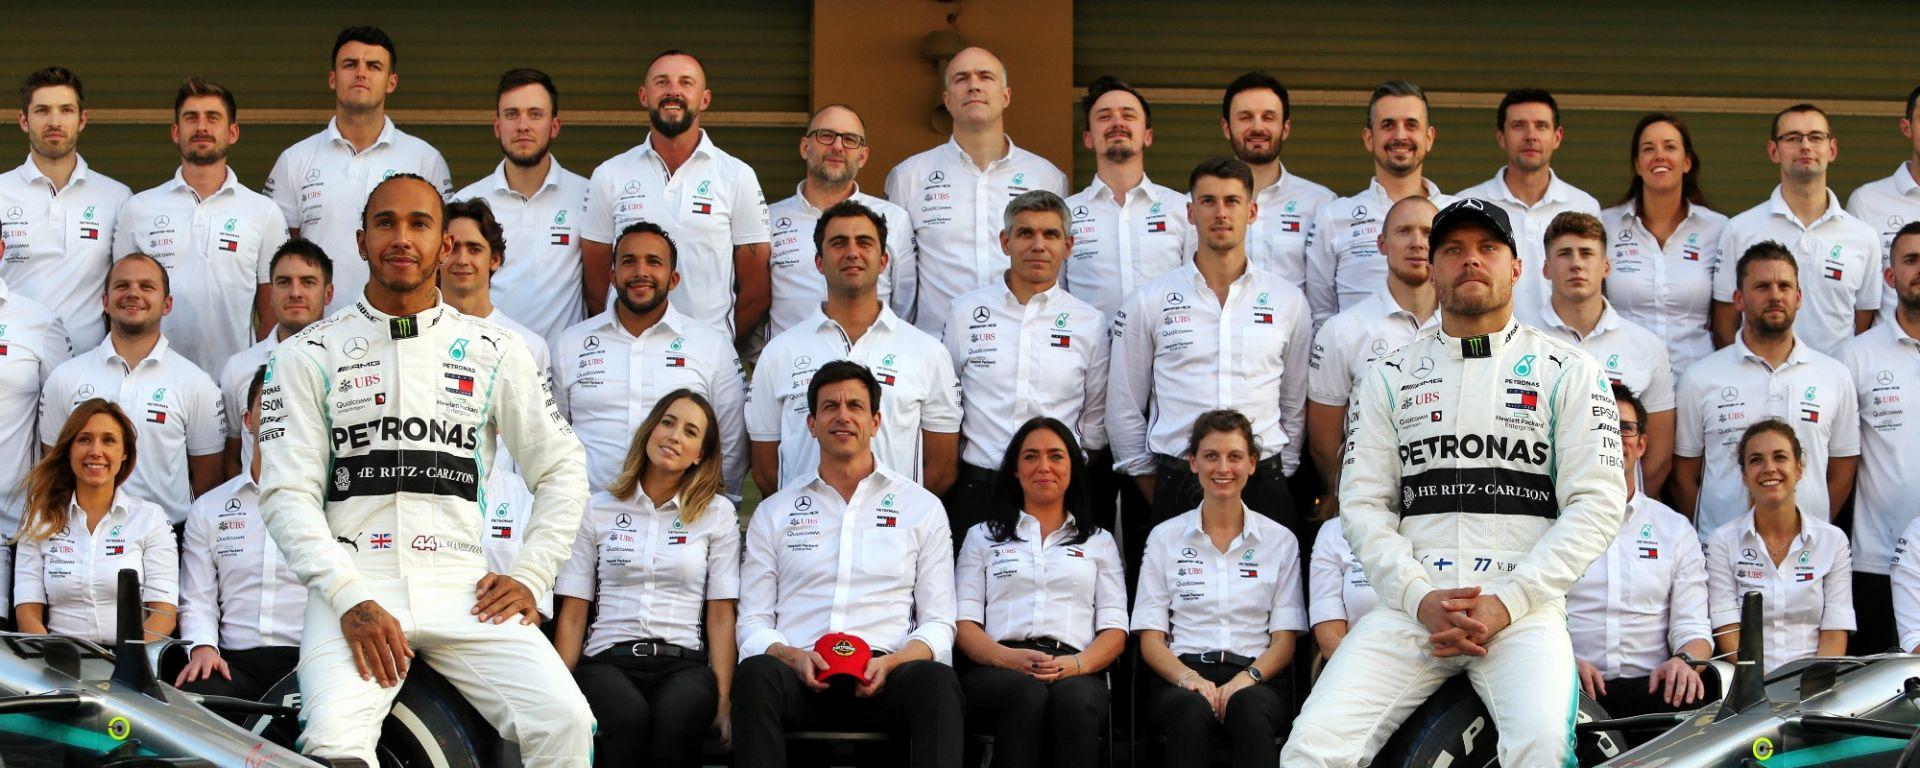 Formula 1 Team Mercedes 2019, Lewis Hamilton, Valtteri Bottas, Toto Wolff